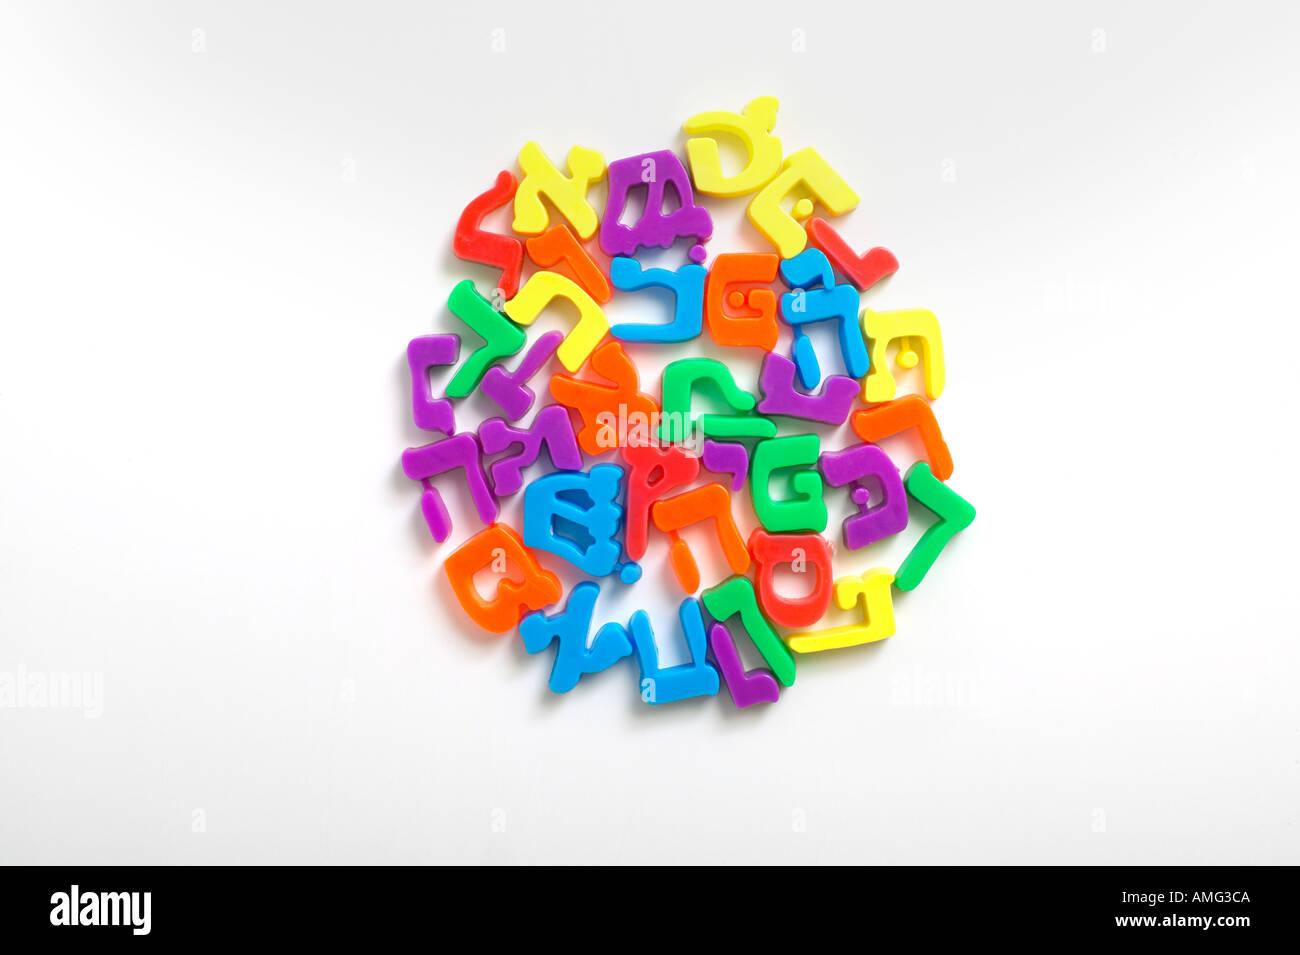 kids hebrew aleph bet fridge magnets forming a globe - Stock Image